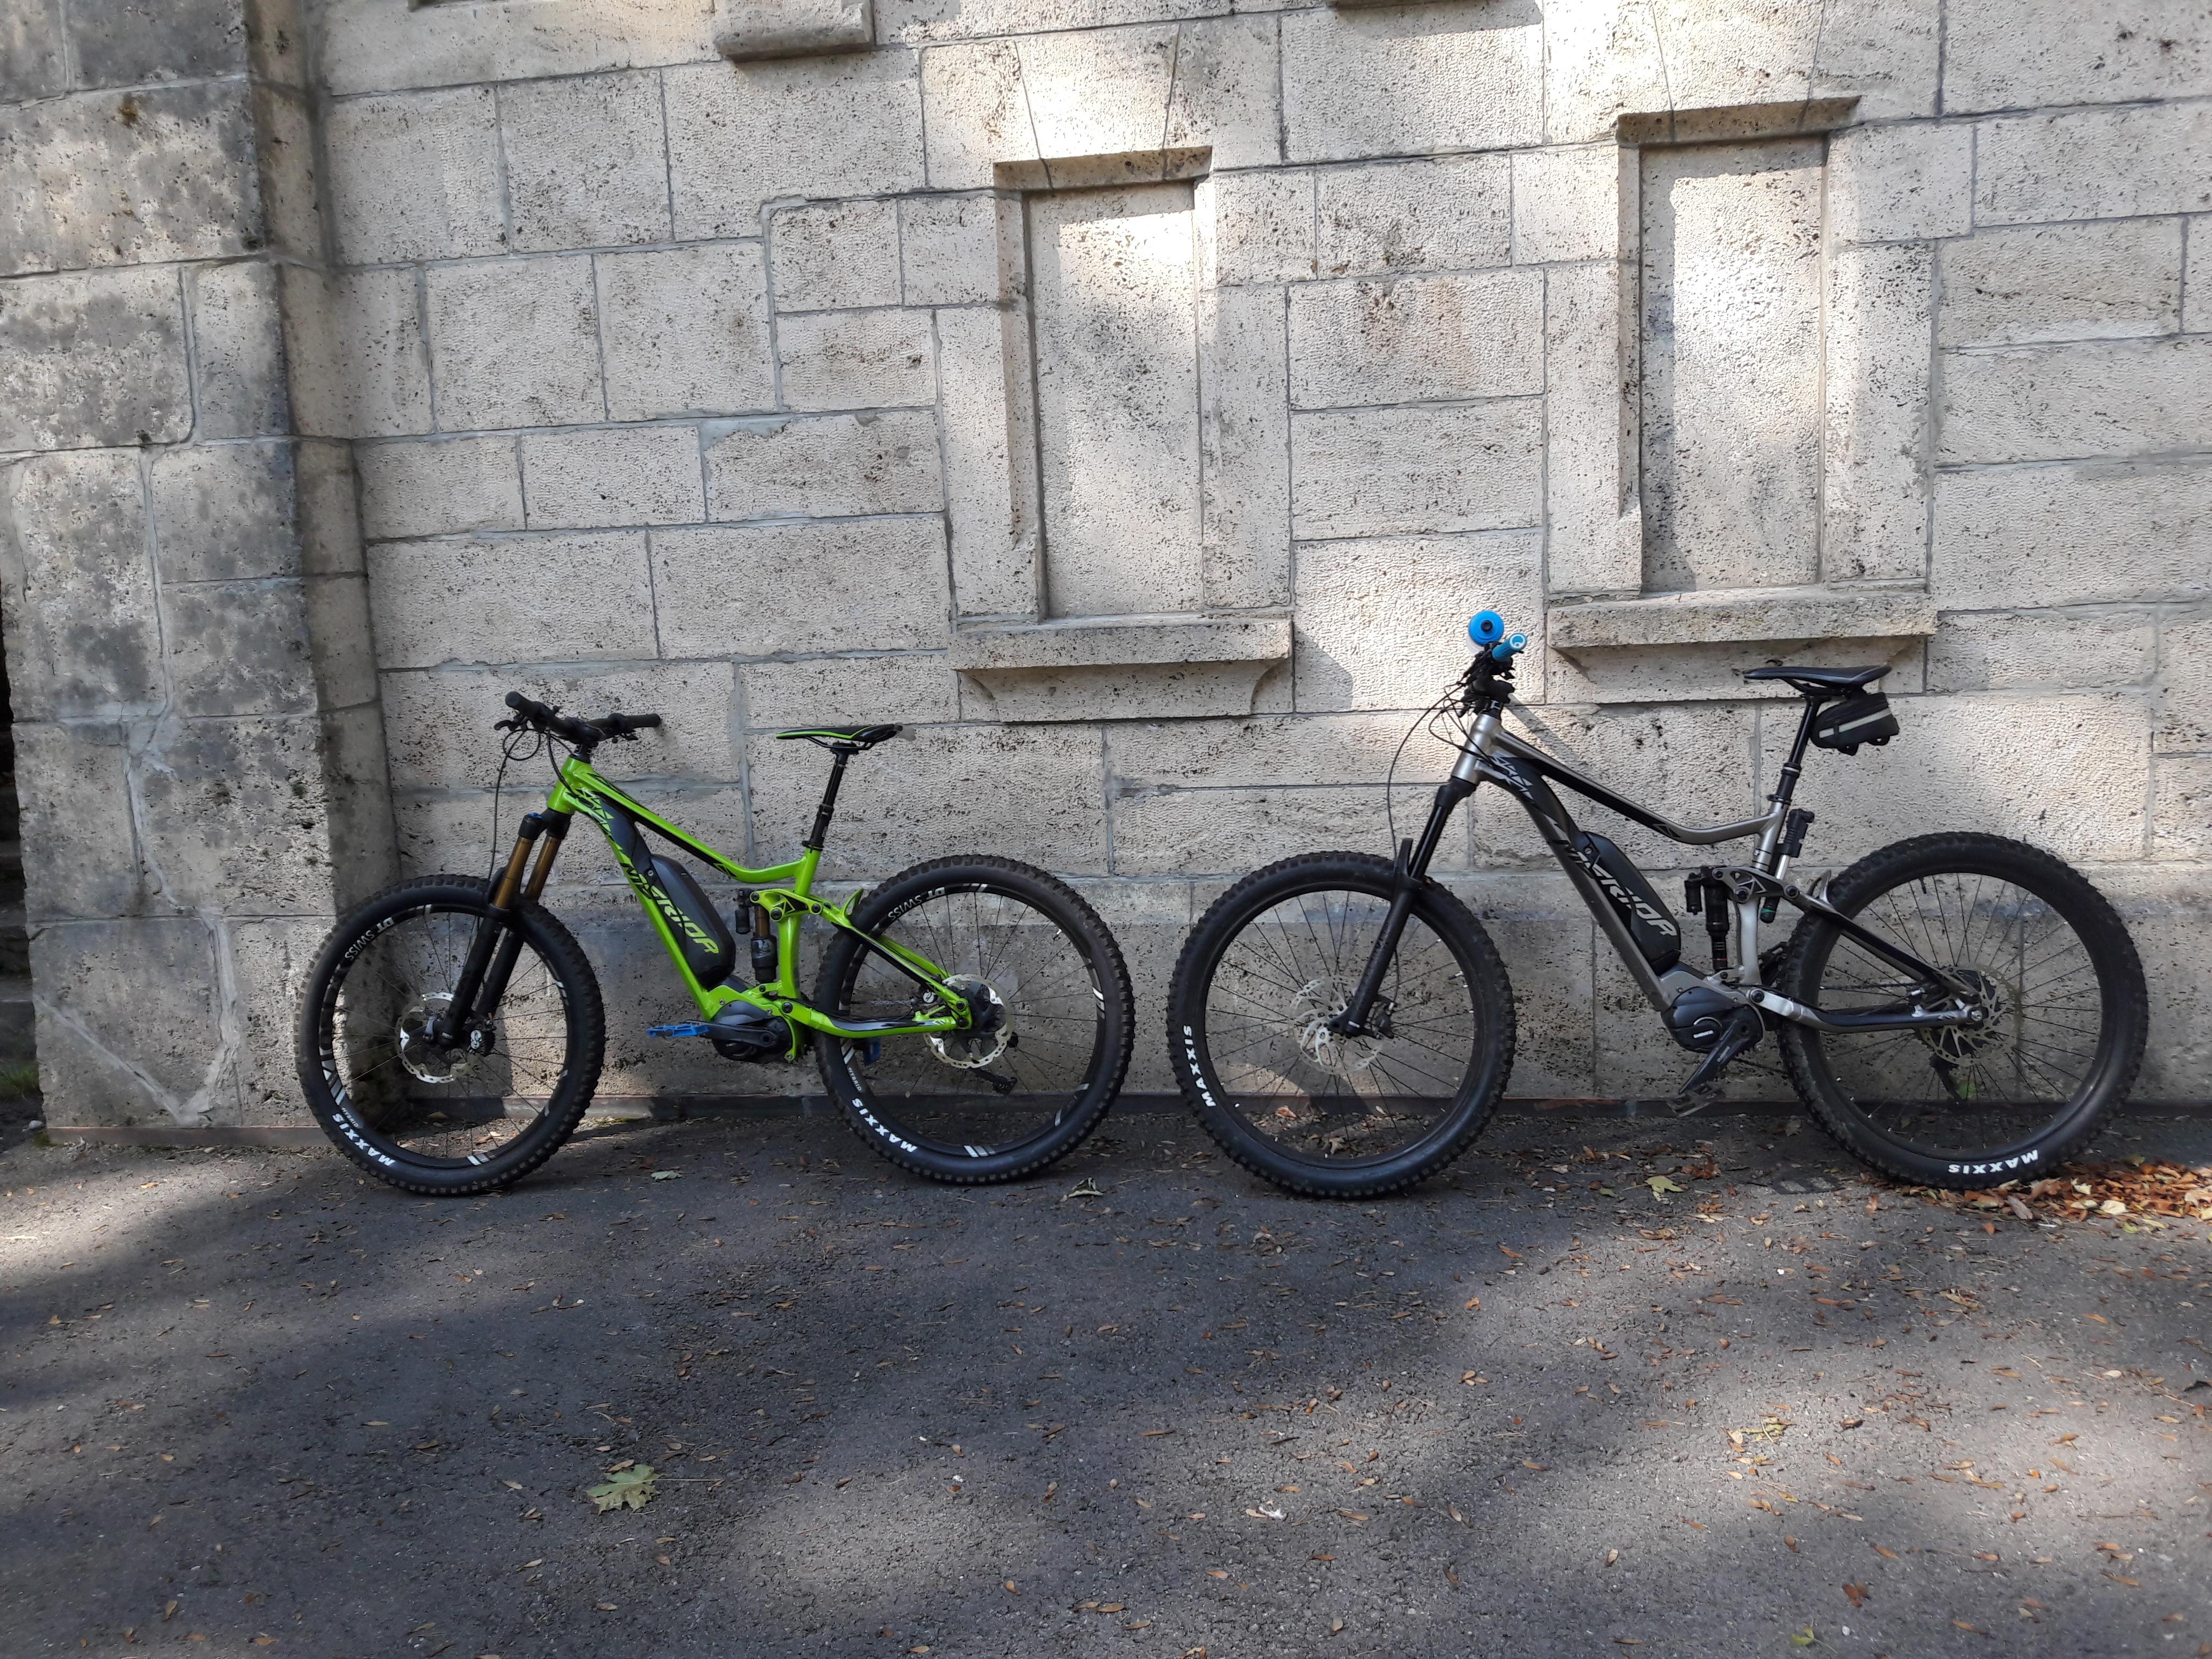 Faszination E-Bike Blog - Gesellschaft profitiert und Fahrradfahrern